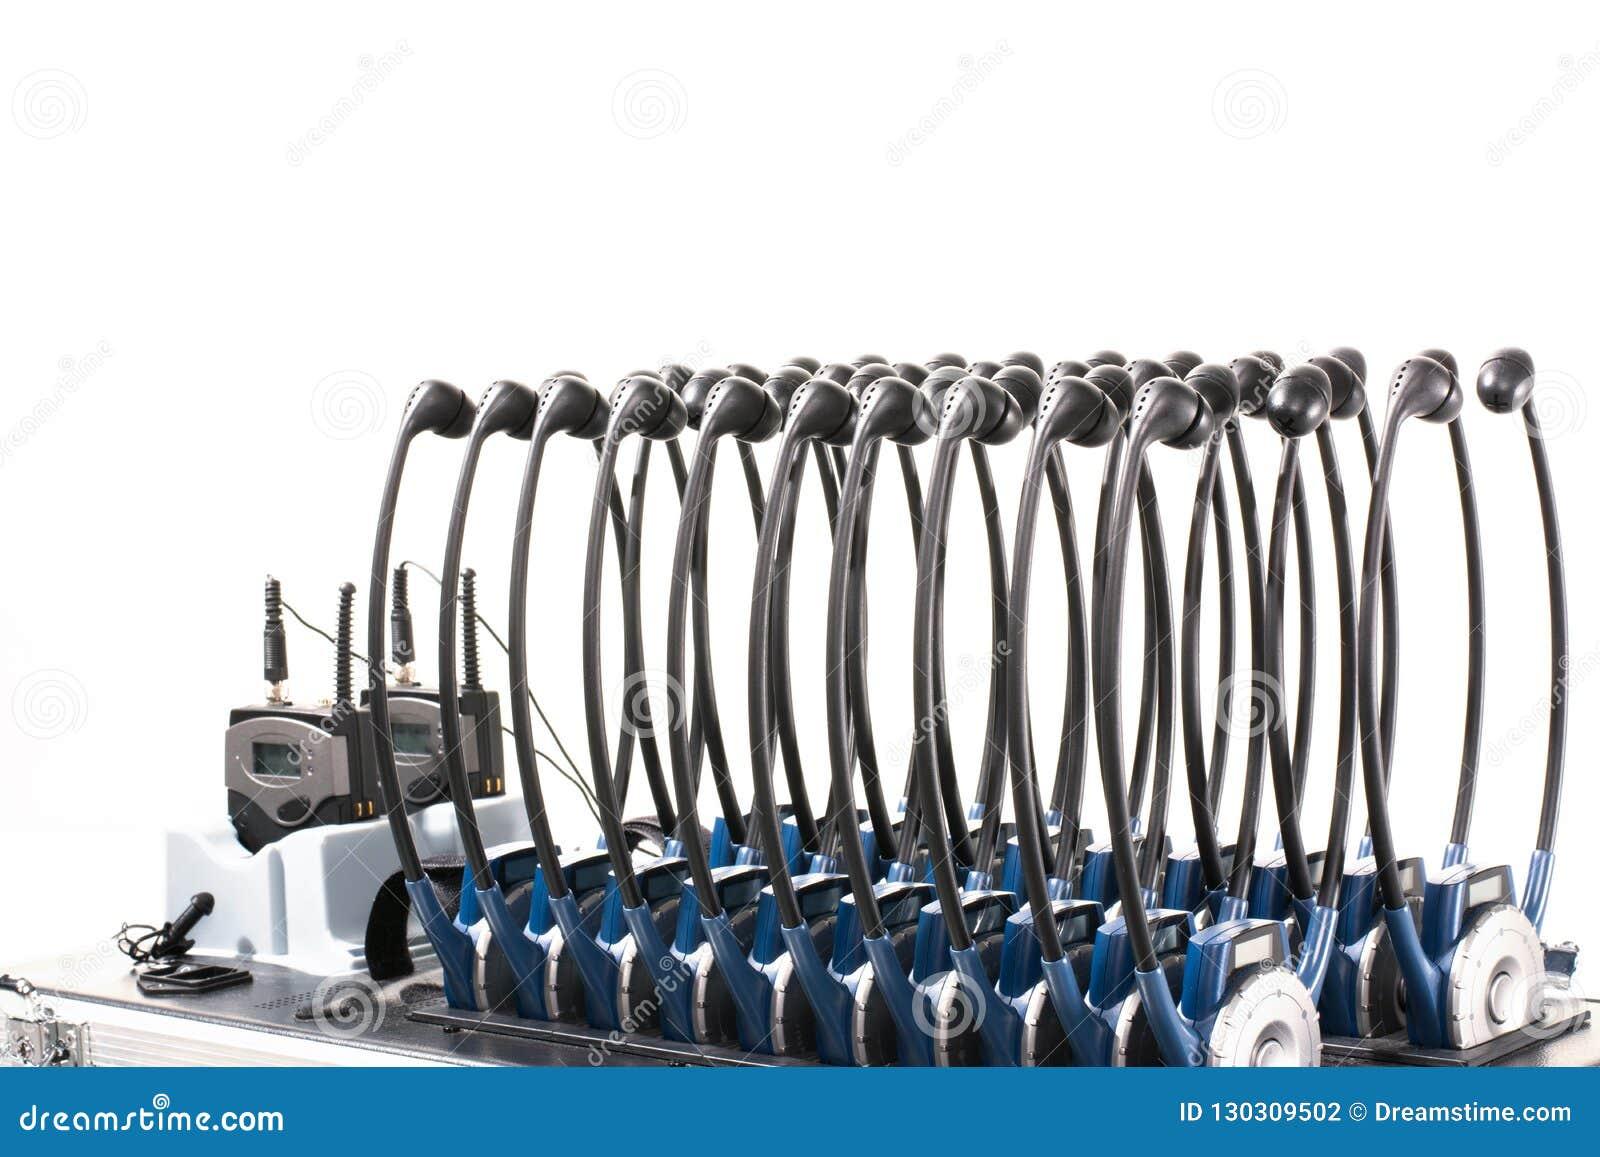 Equipment for translating languages